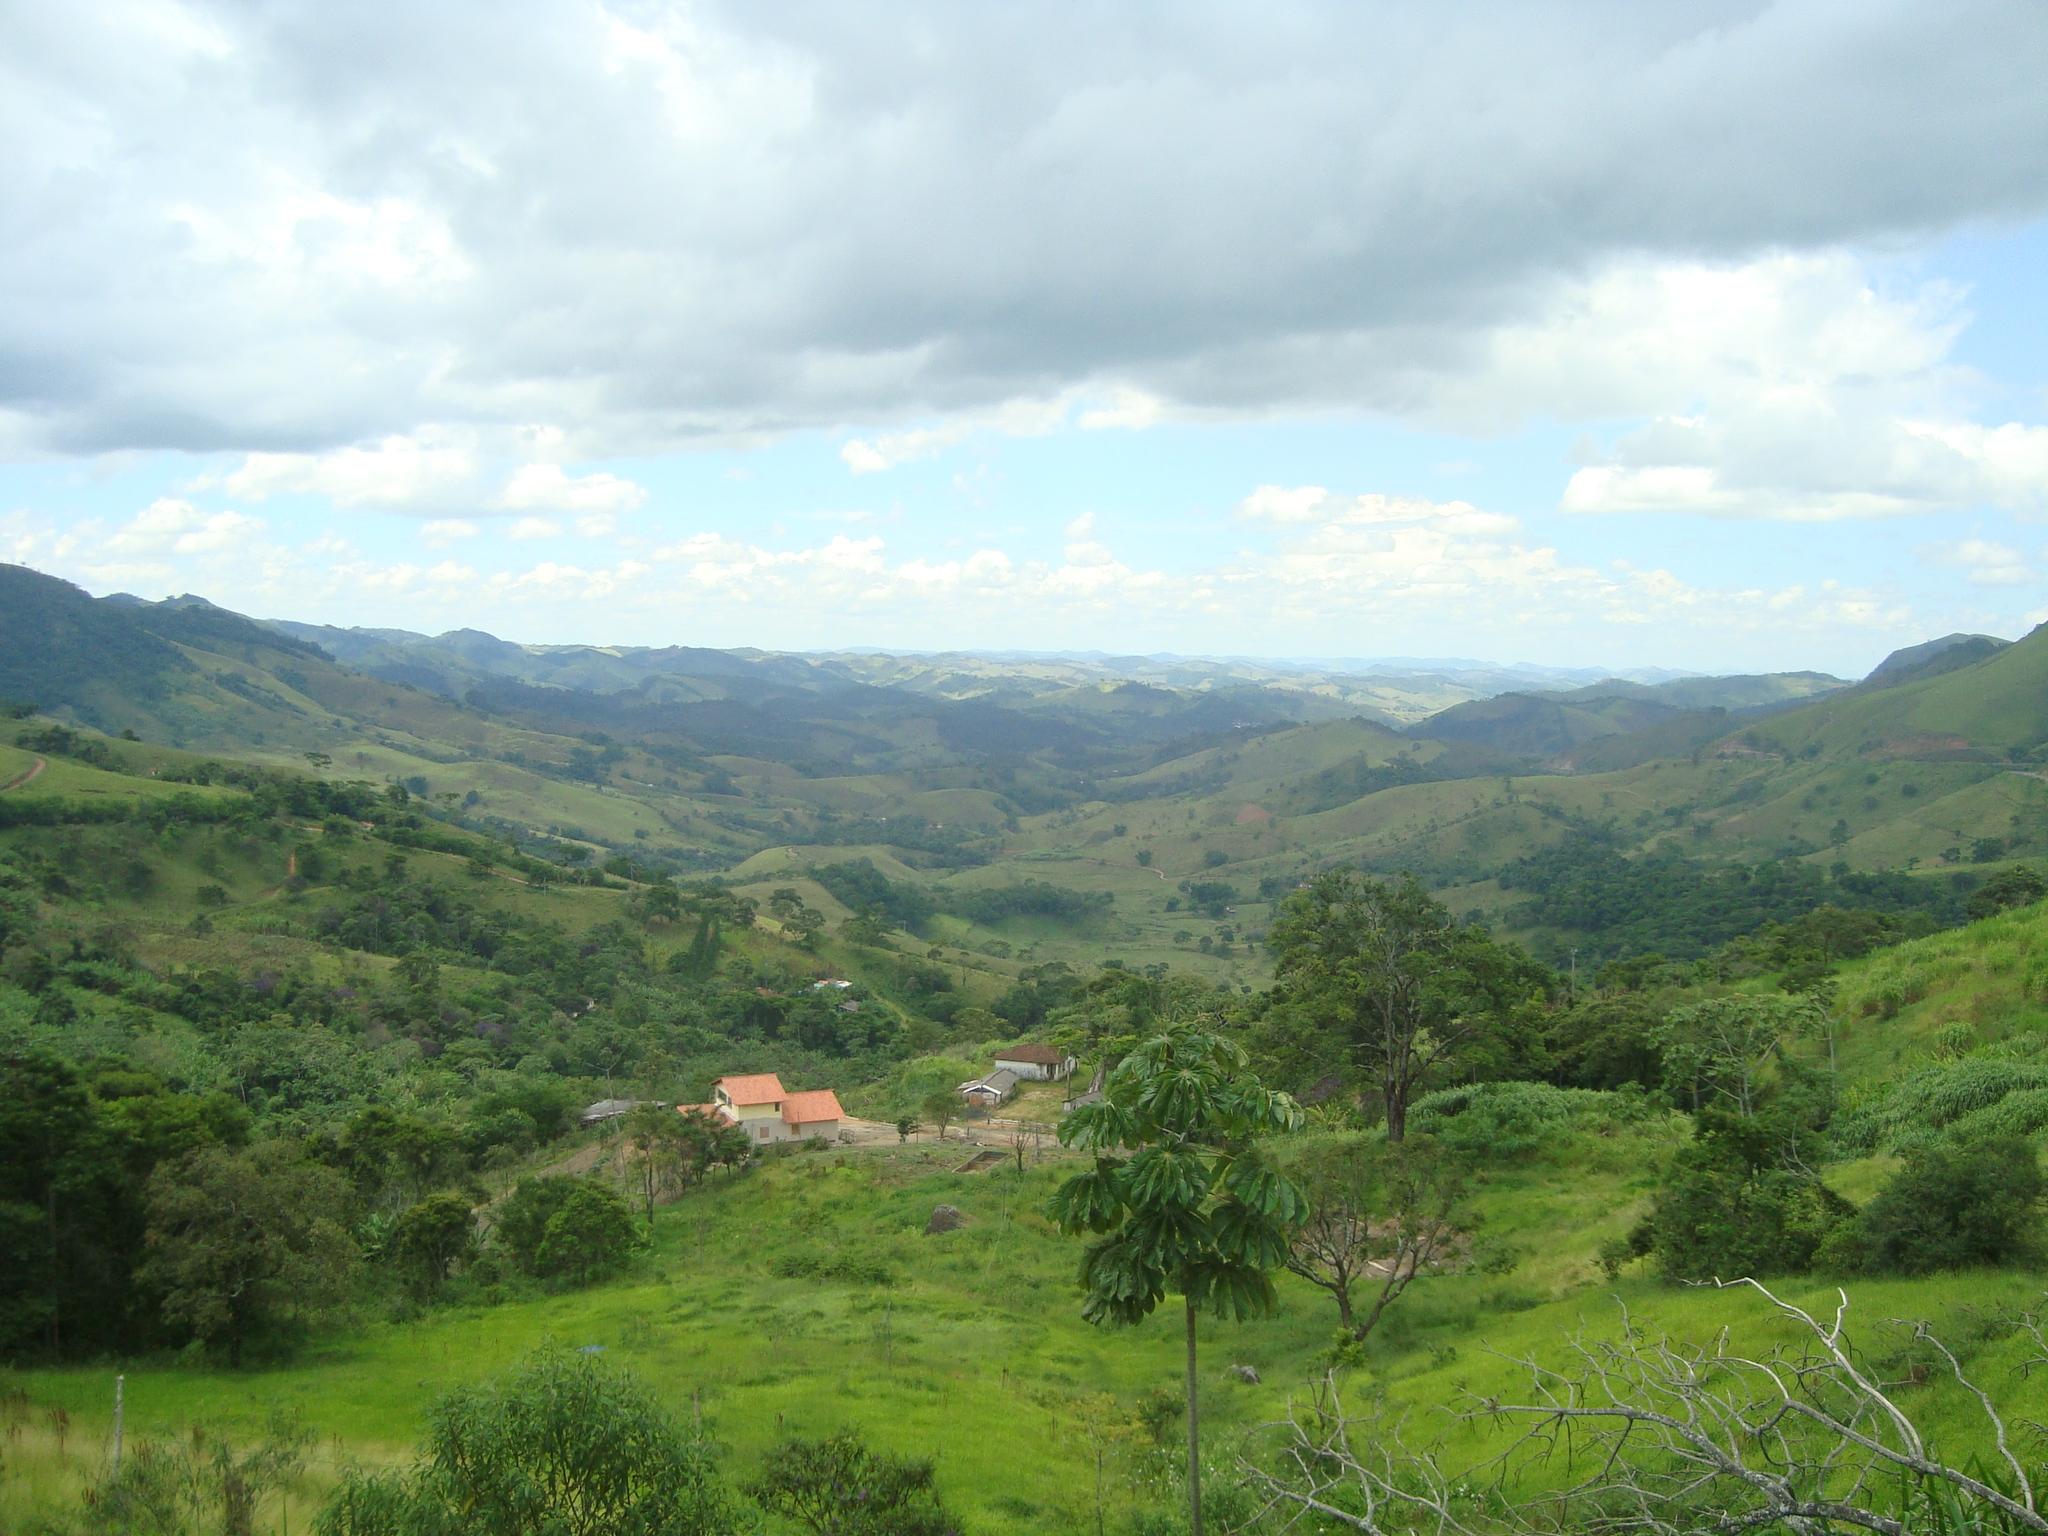 Santa Bárbara do Tugúrio Minas Gerais fonte: upload.wikimedia.org